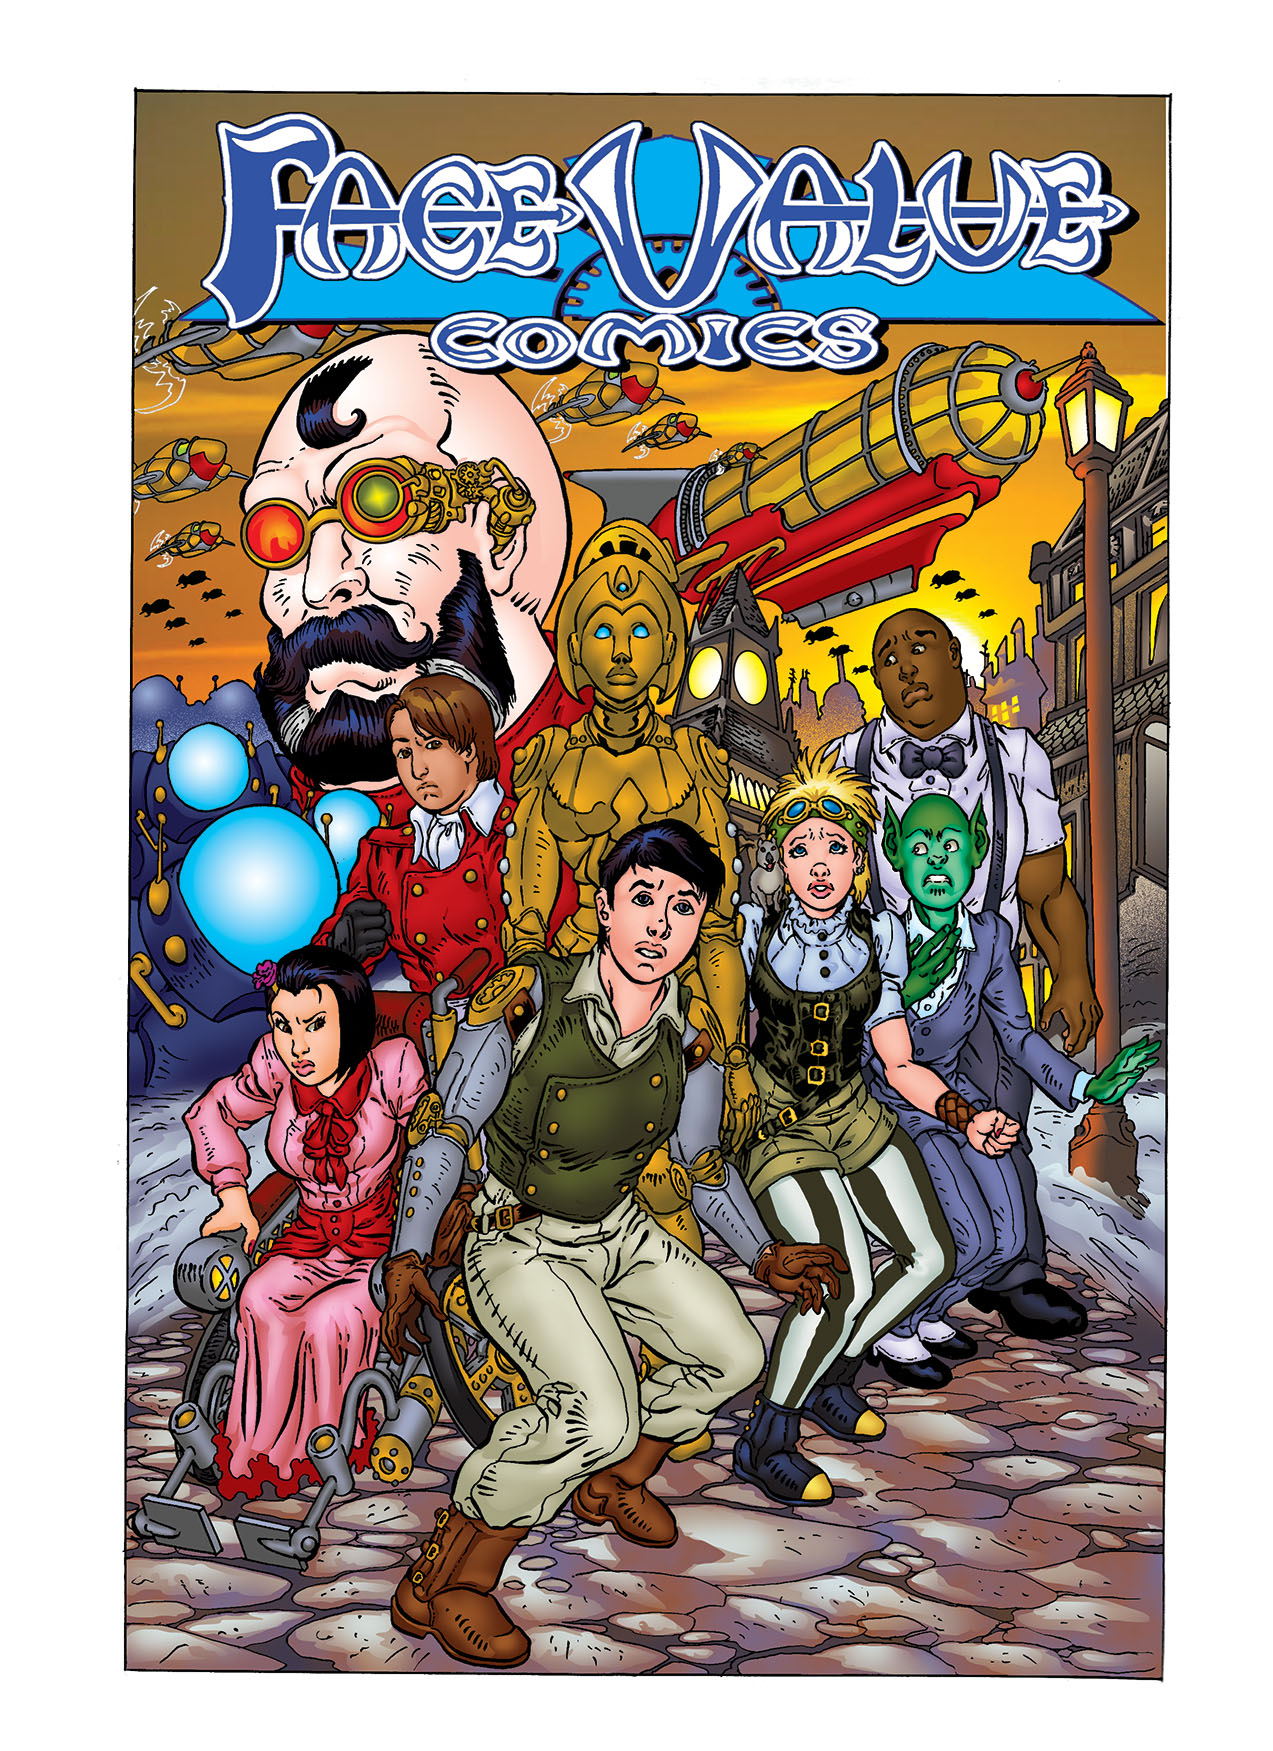 Face Value Comics' Autistic Superhero. # ...